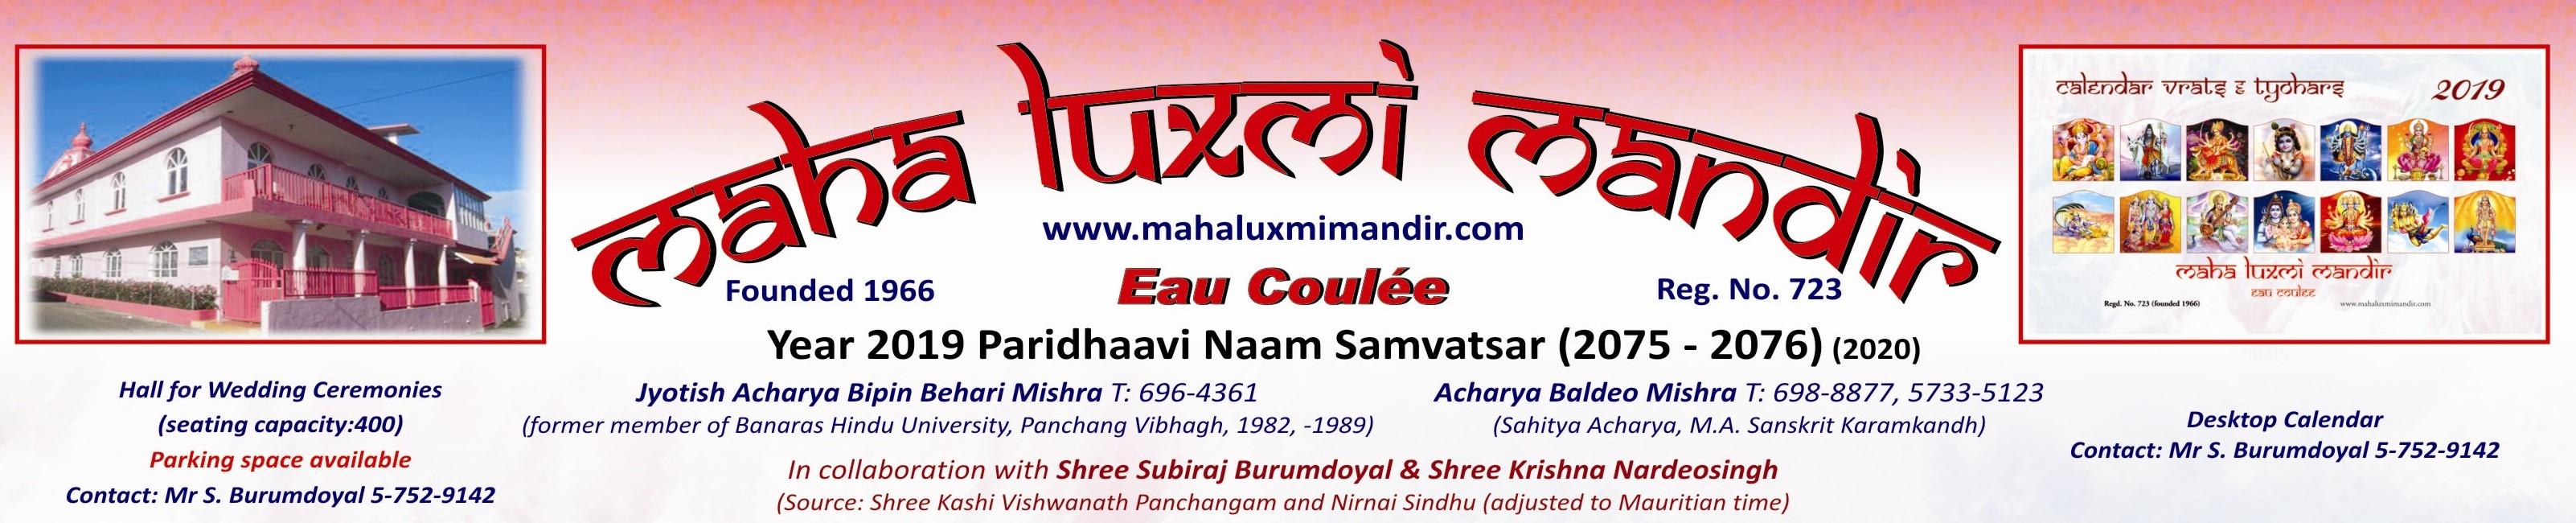 Hindu Desktop Calendar | Maha Luxmi Mandir, Eau-Coulee